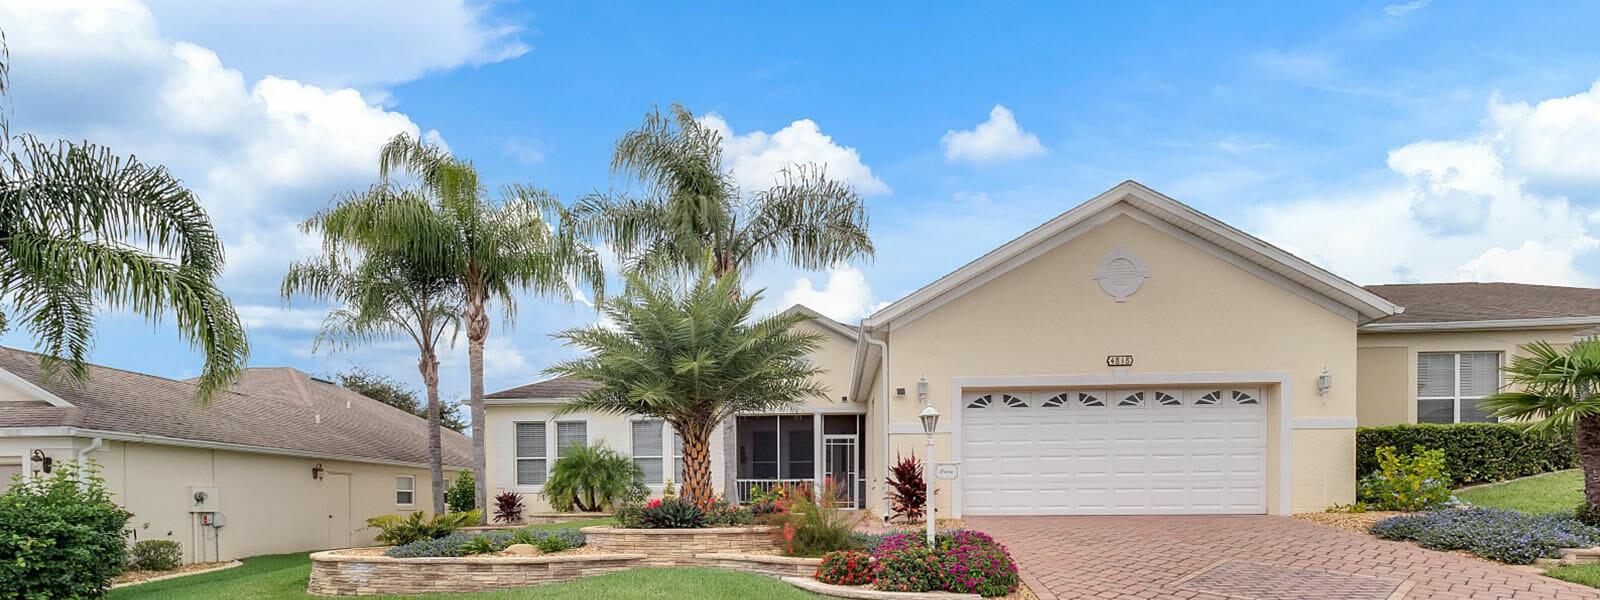 Active 55+ Community near Orlando FL | Plantation at Leesburg | Realty